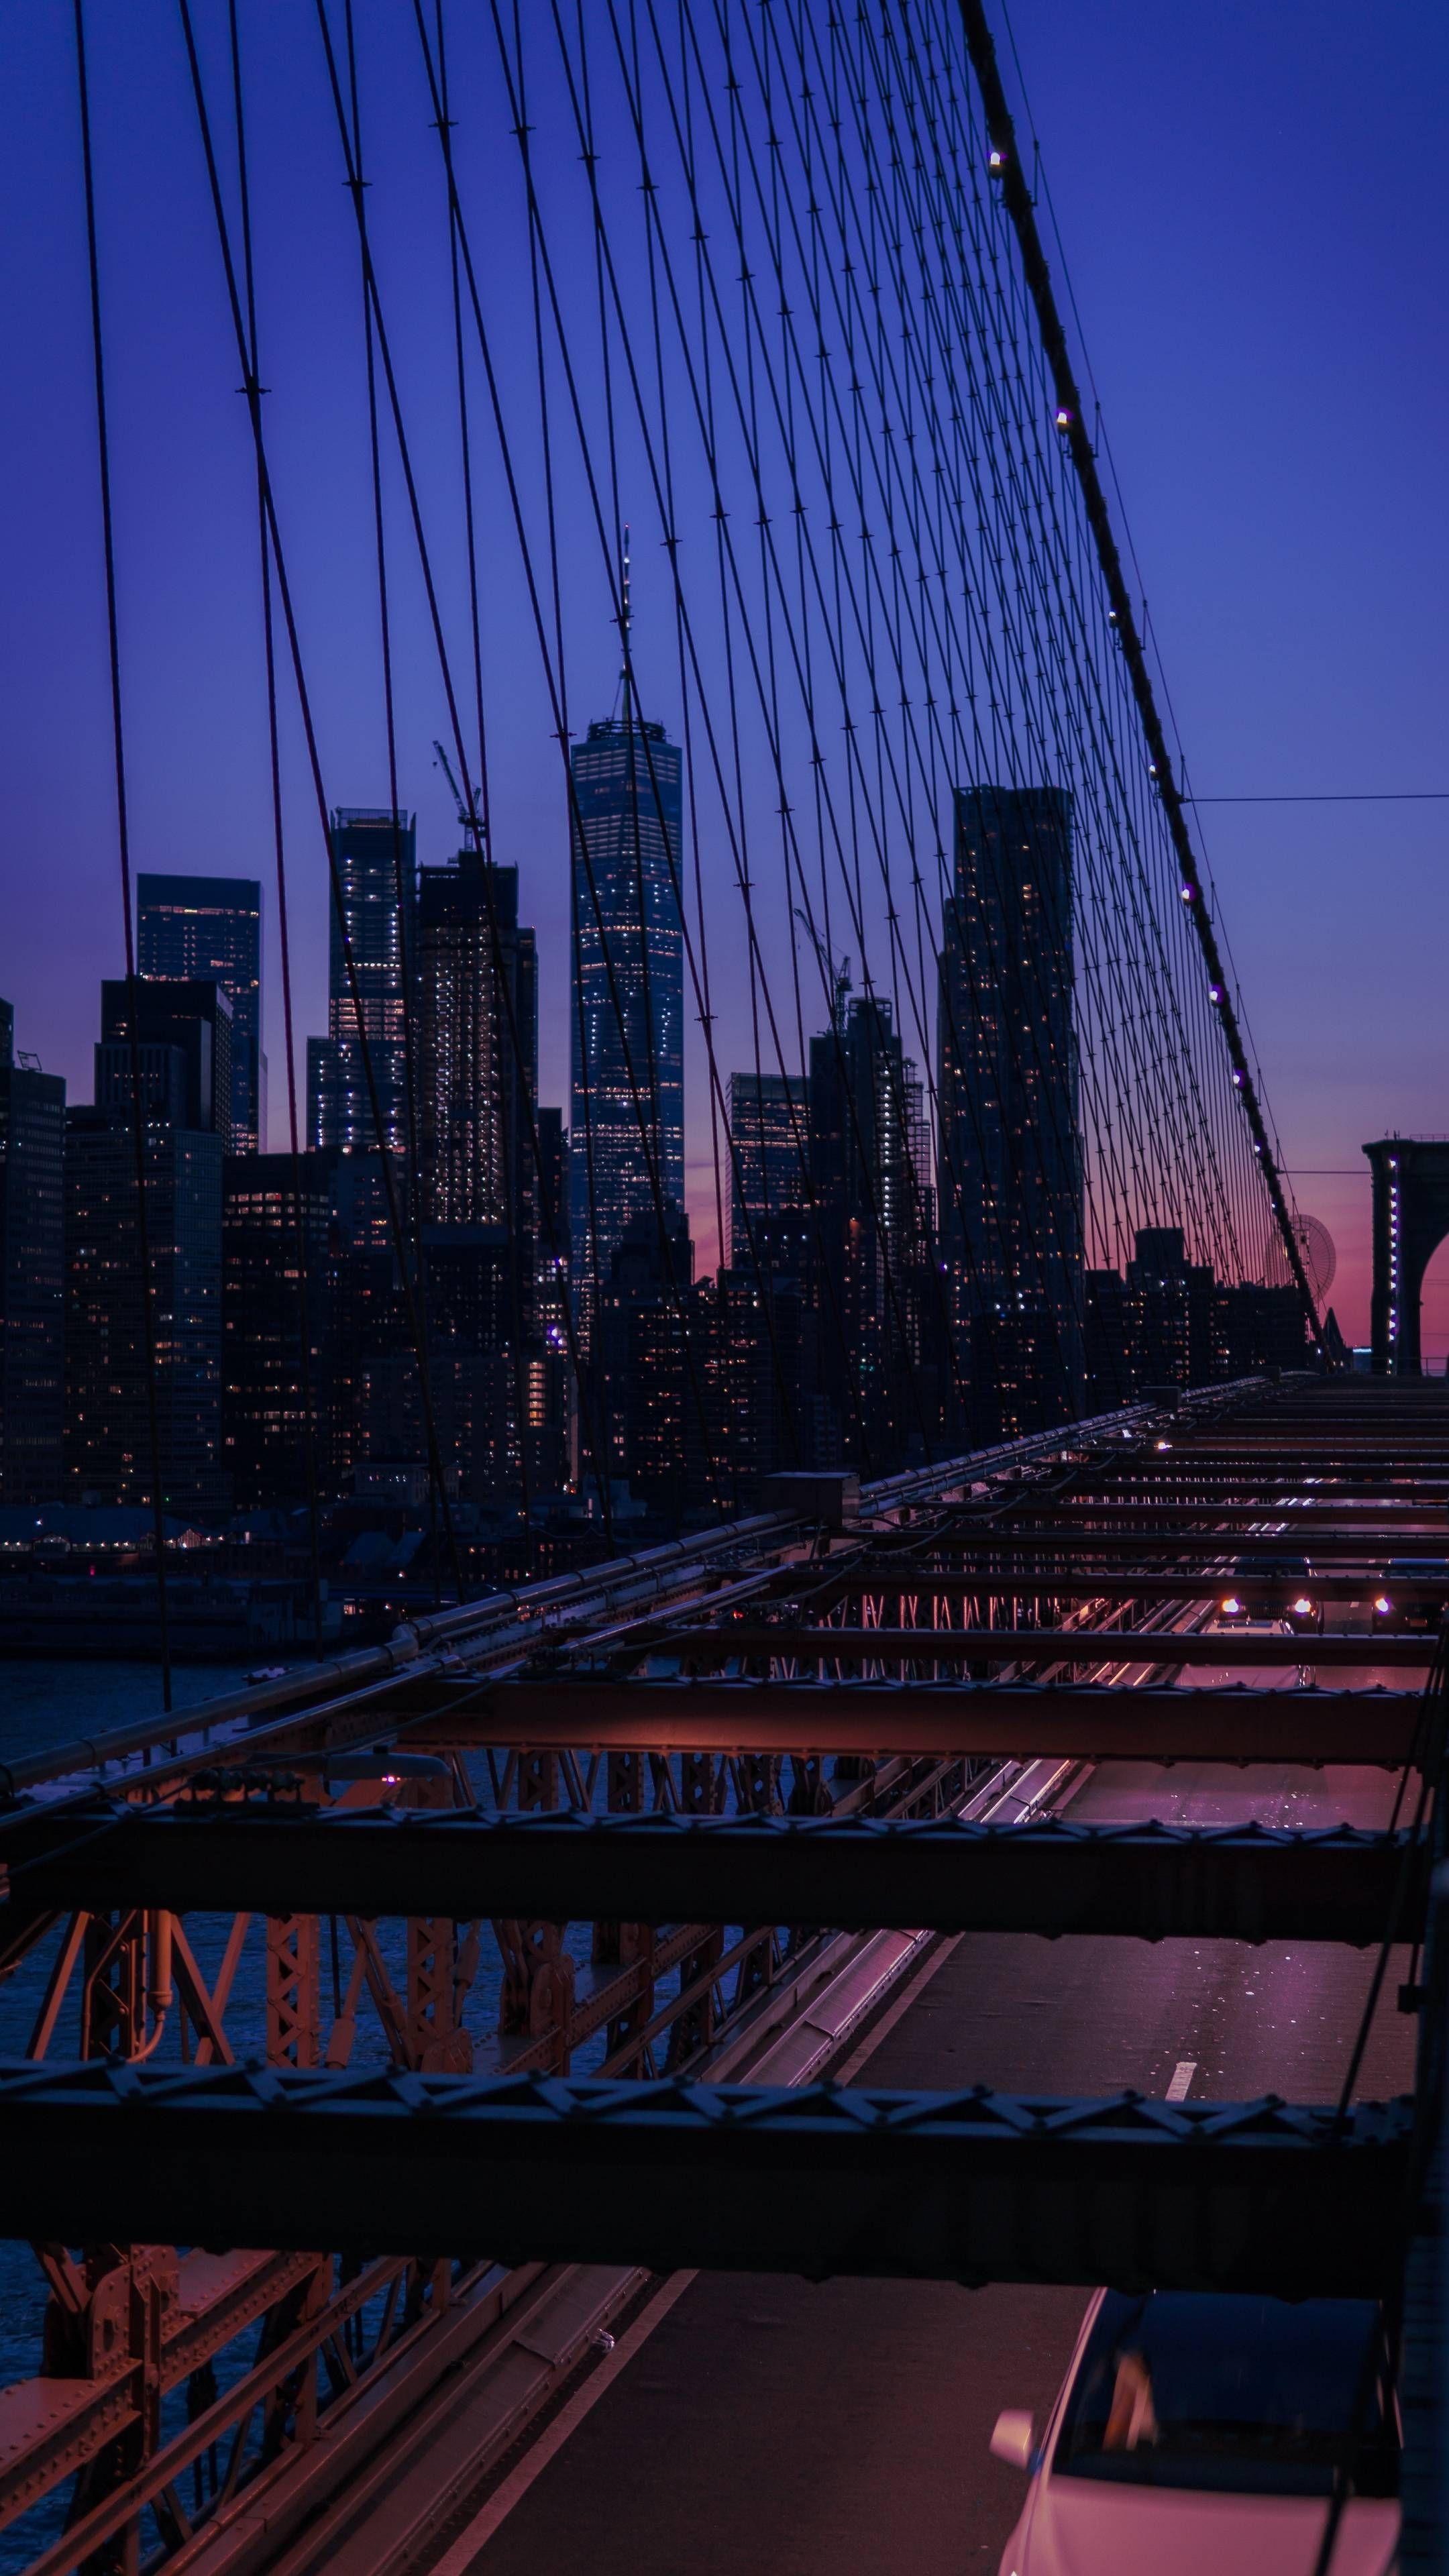 Download Iphone Xs Iphone Xs Max Iphone Xr Hd Wallpapers Bridge City Twilight Buildings Skyscrapers View O In 2021 New York Wallpaper Skyscraper City Wallpaper